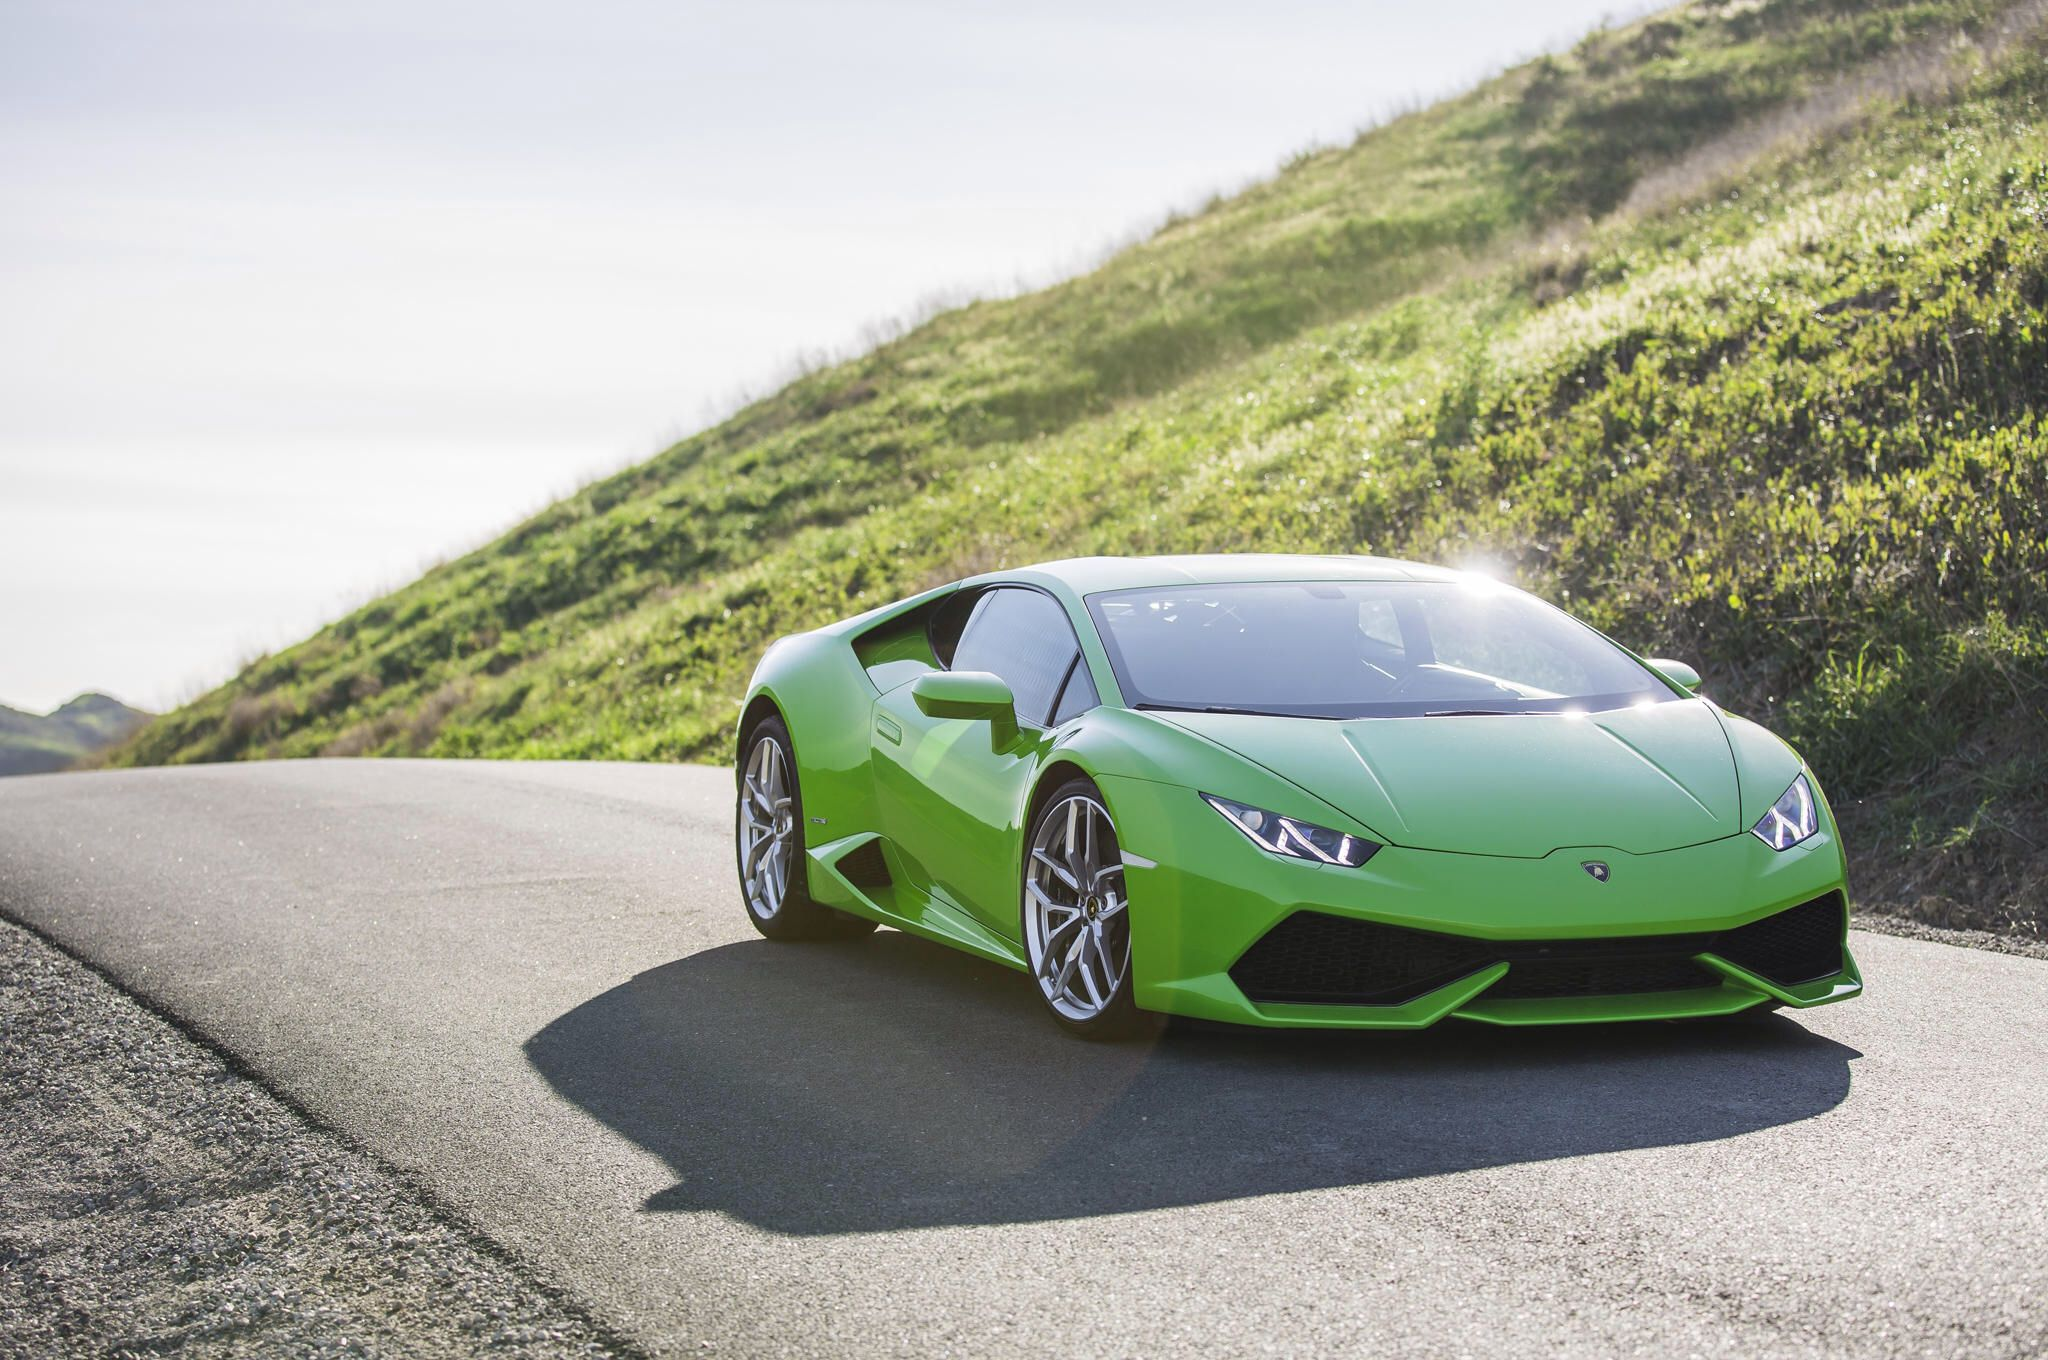 Lamborghini Huracan LP 610-4 First Test Gallery via MOTOR TREND News iPhone App